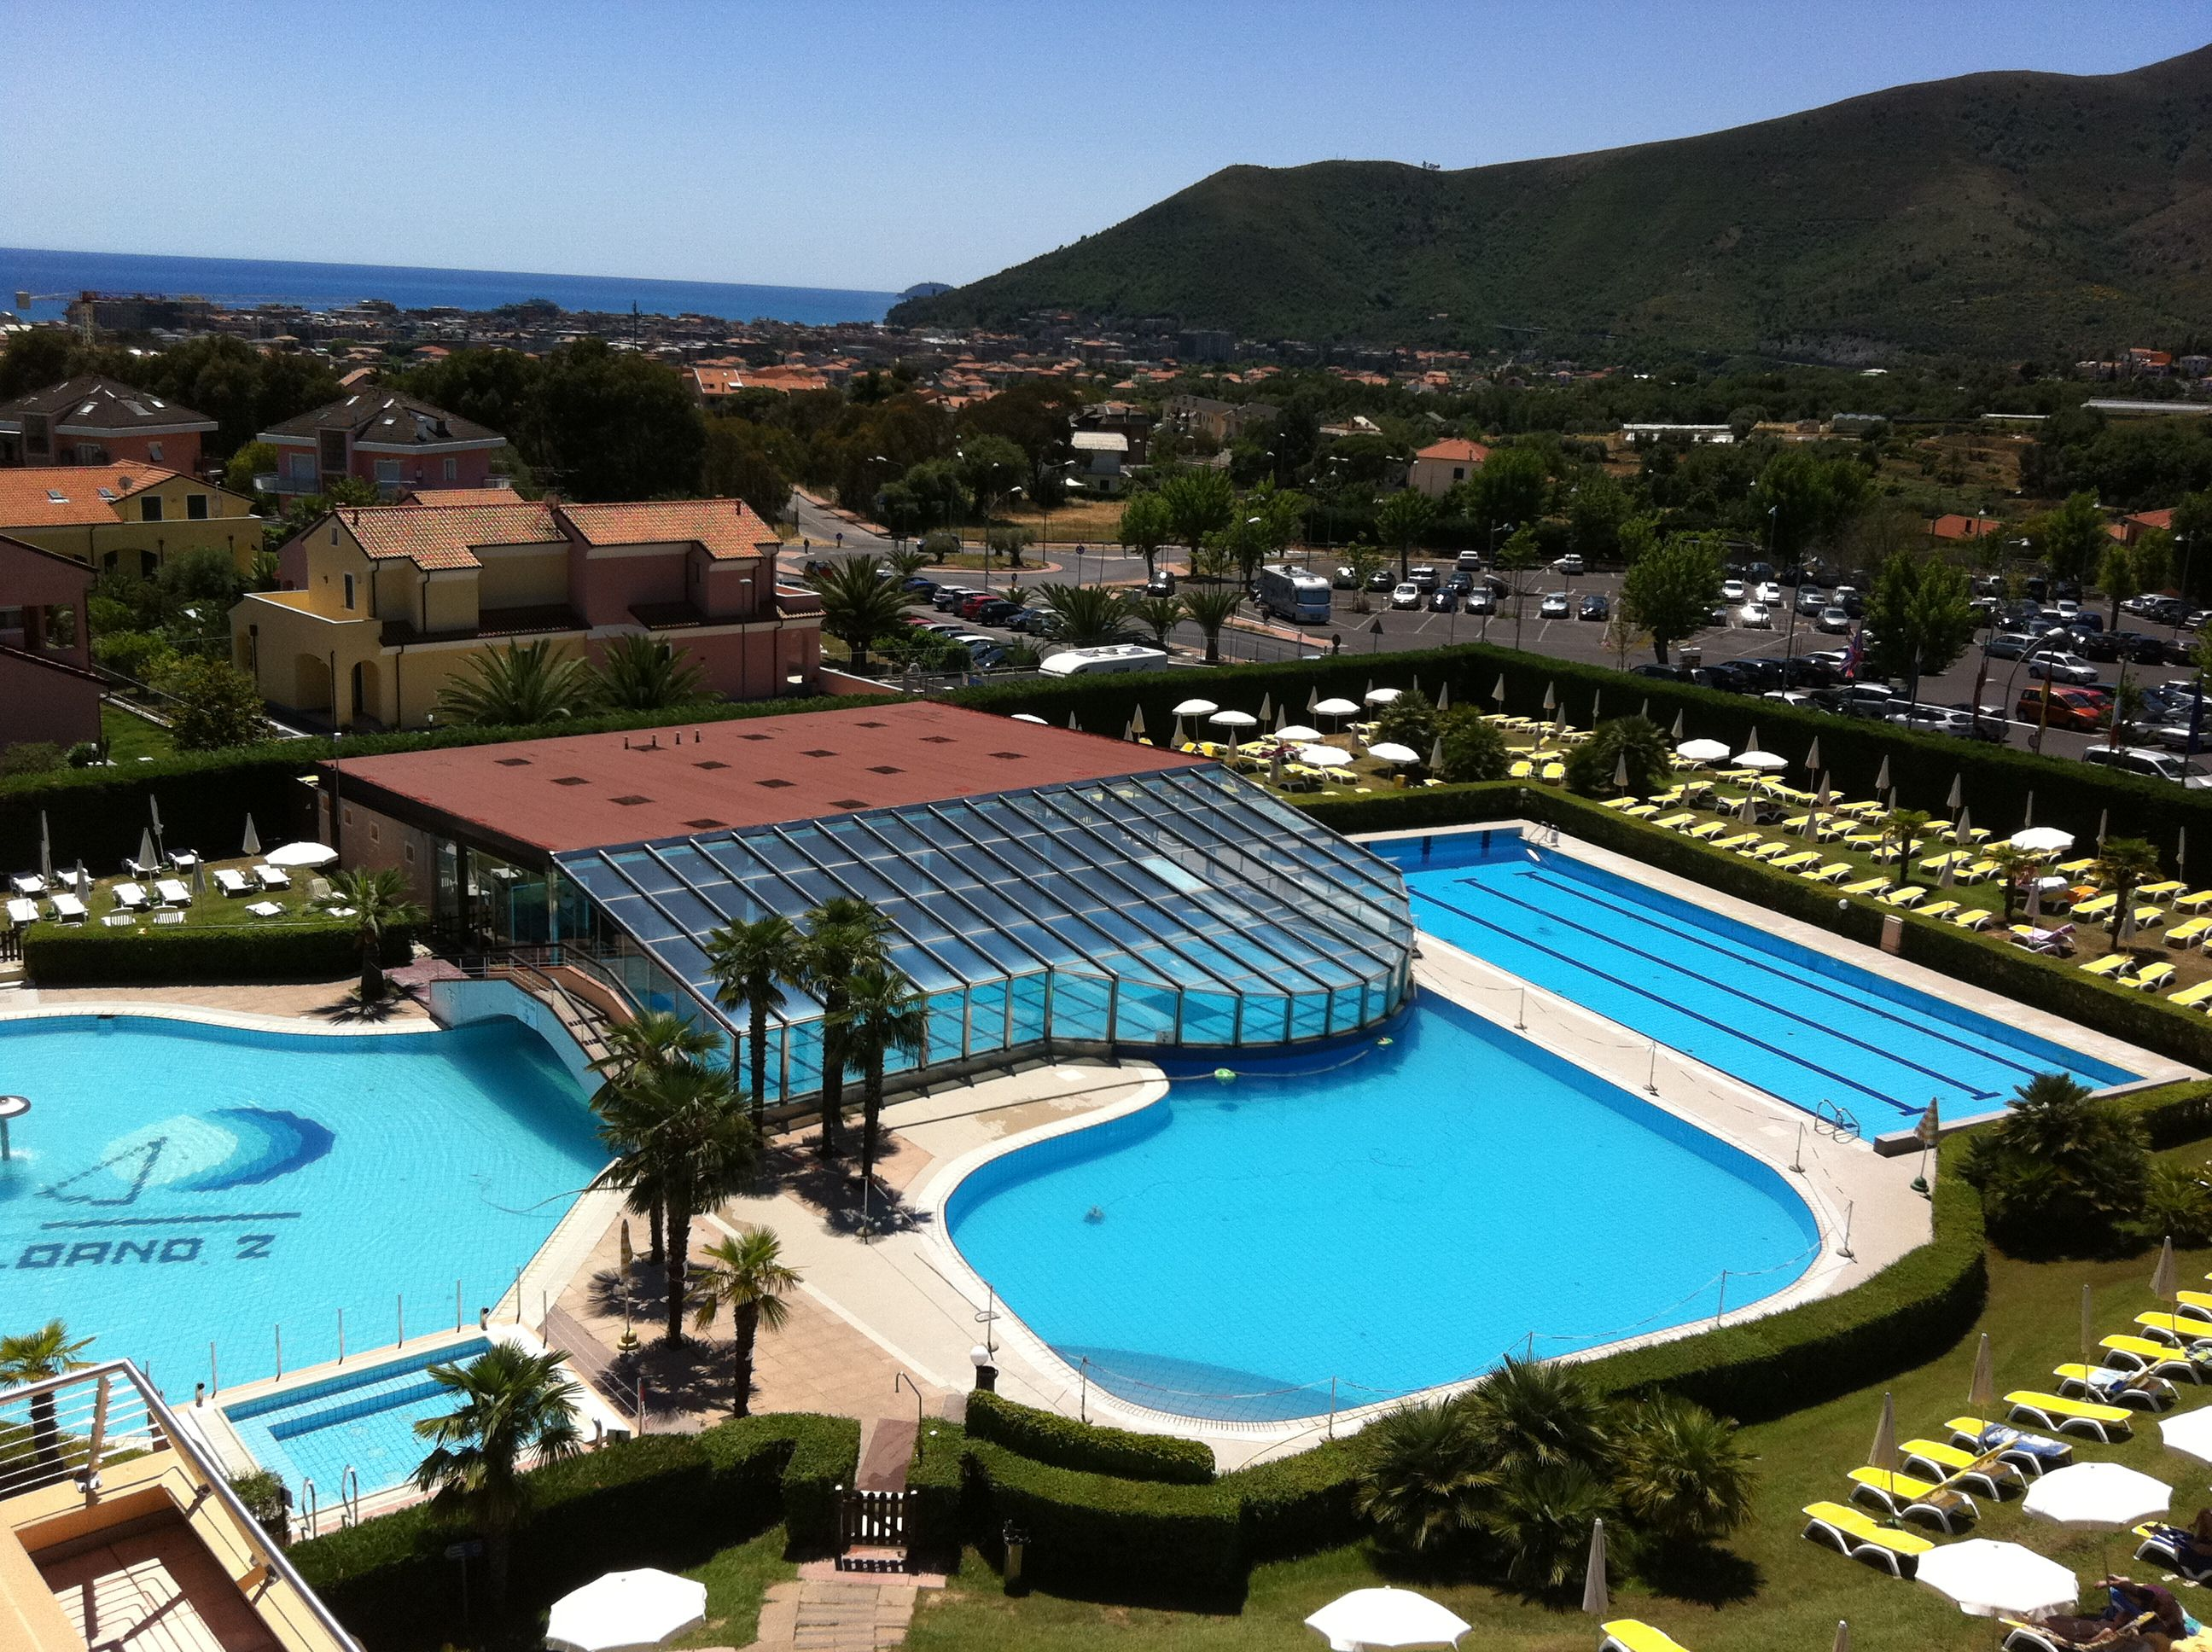 Amazing Pools Loano2village Vacanza Struttura